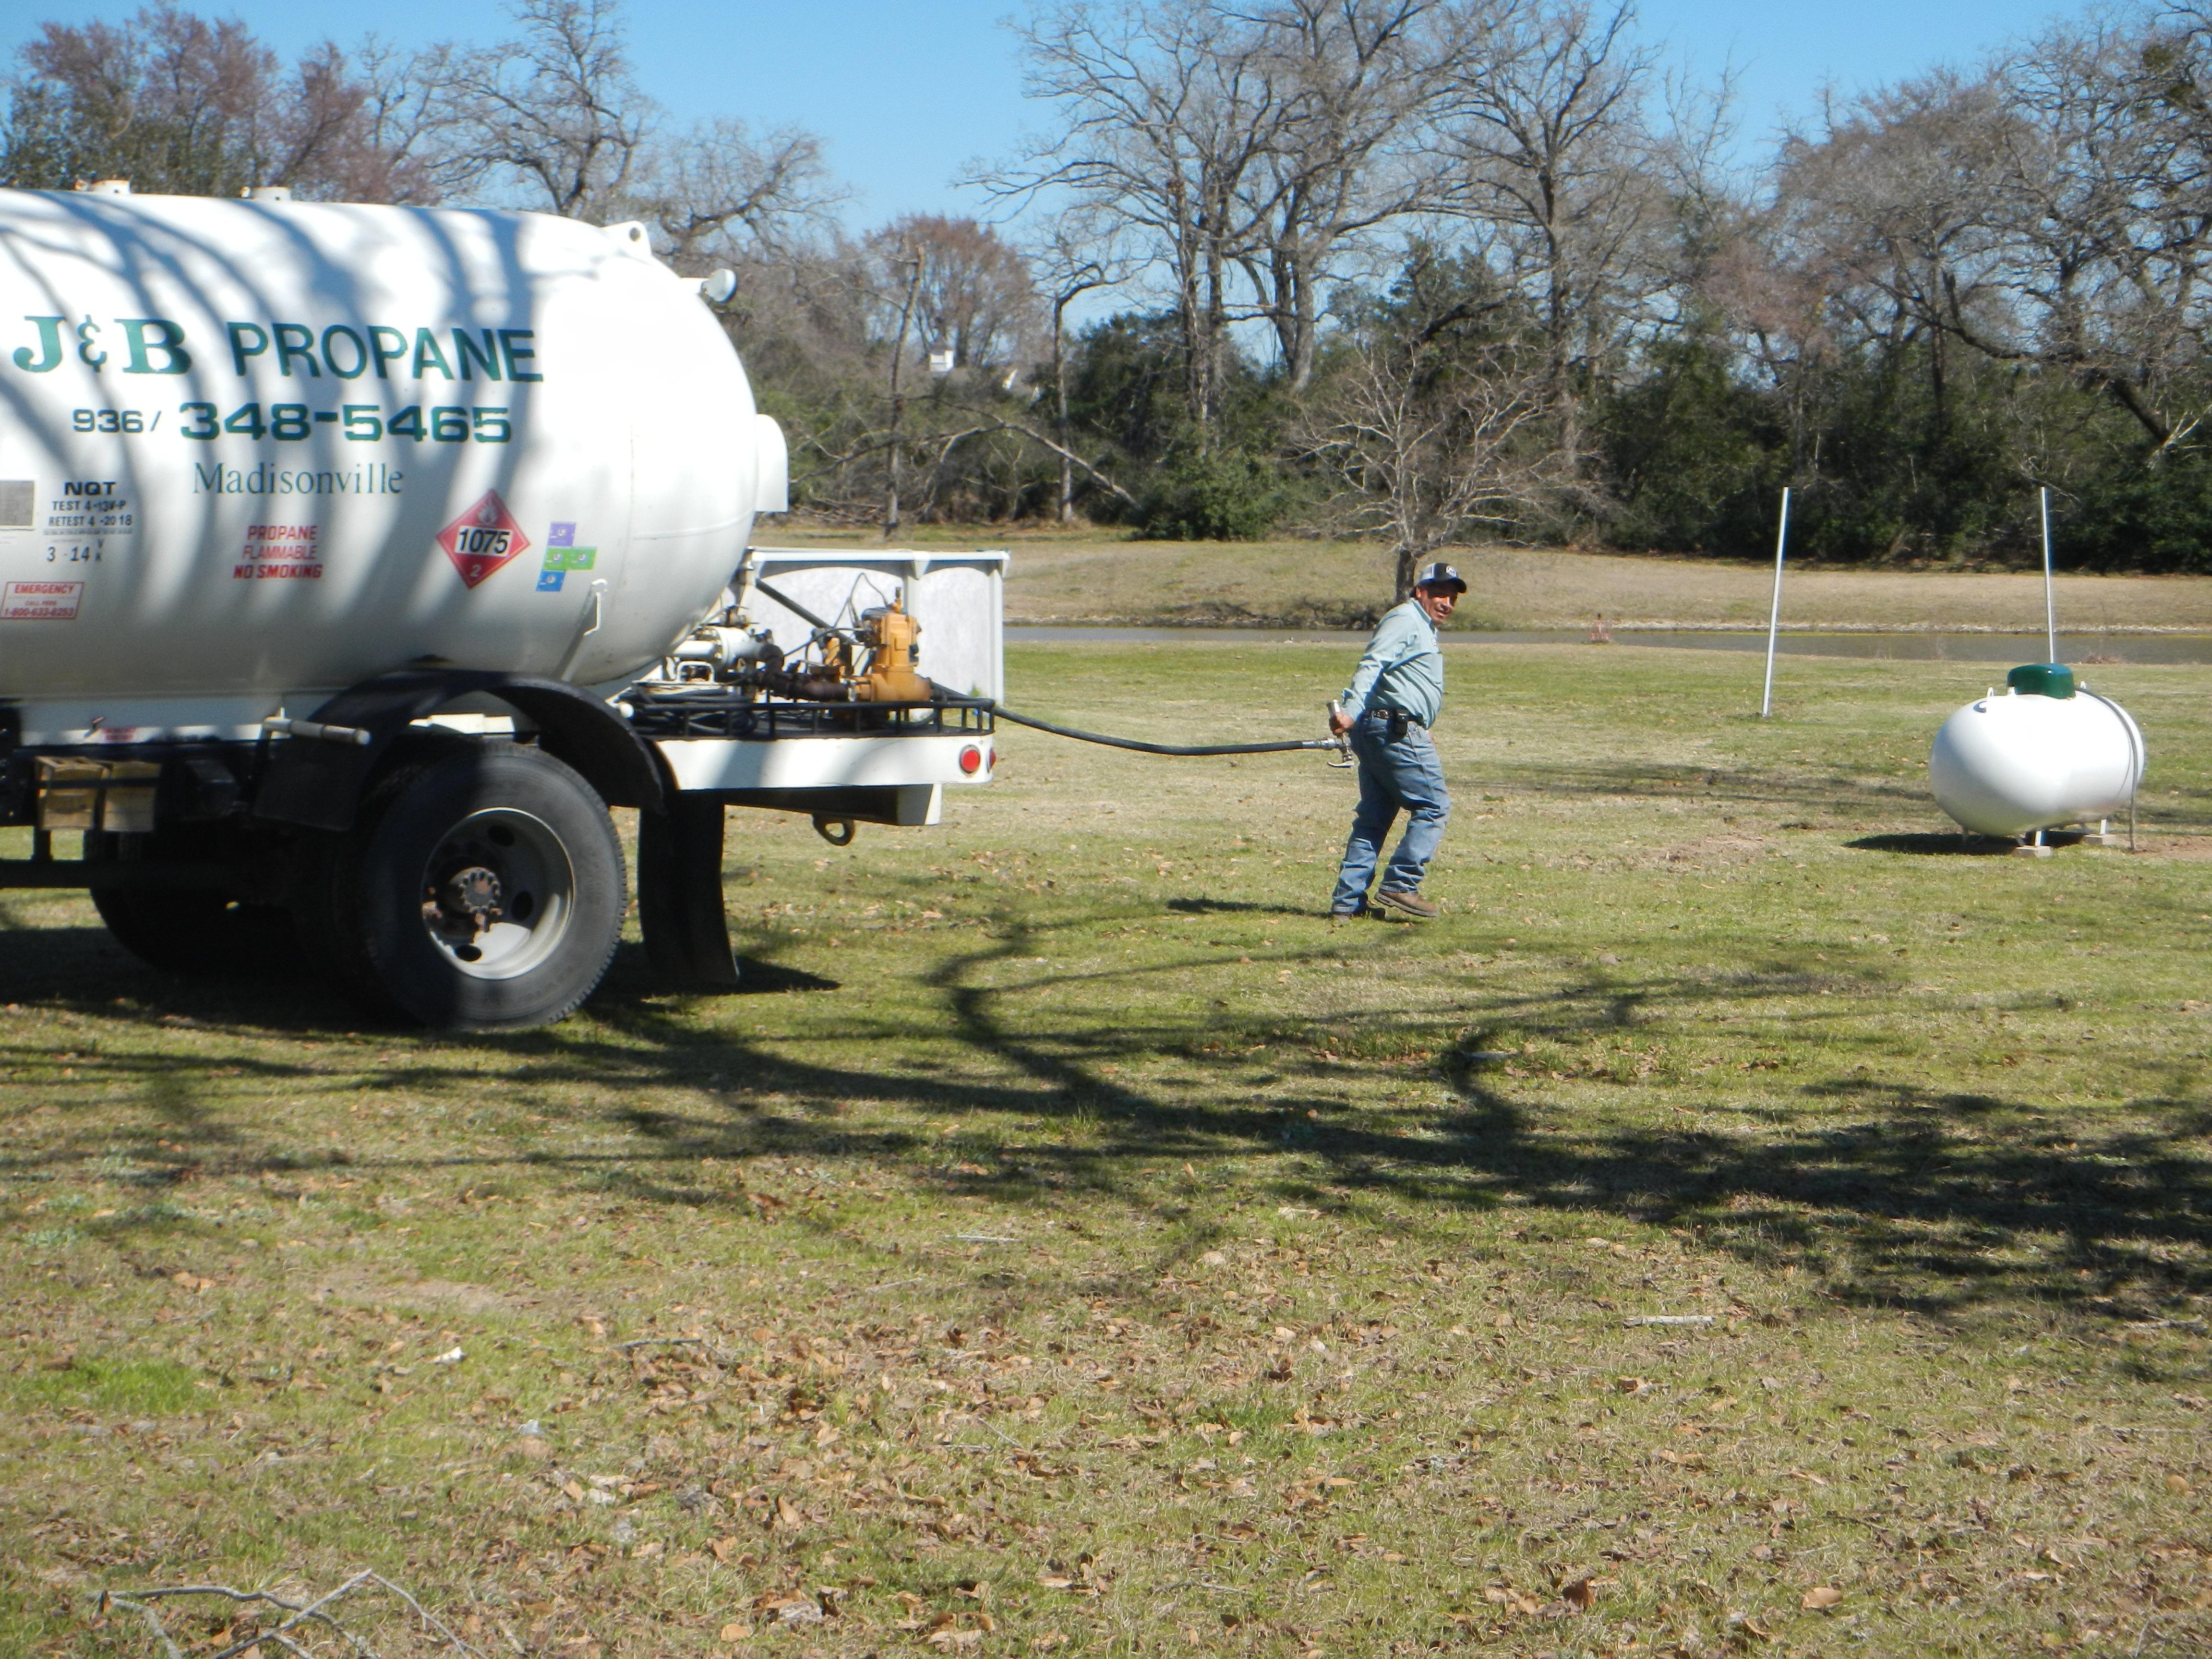 Tank Installation in College Station TX - J & B Propane